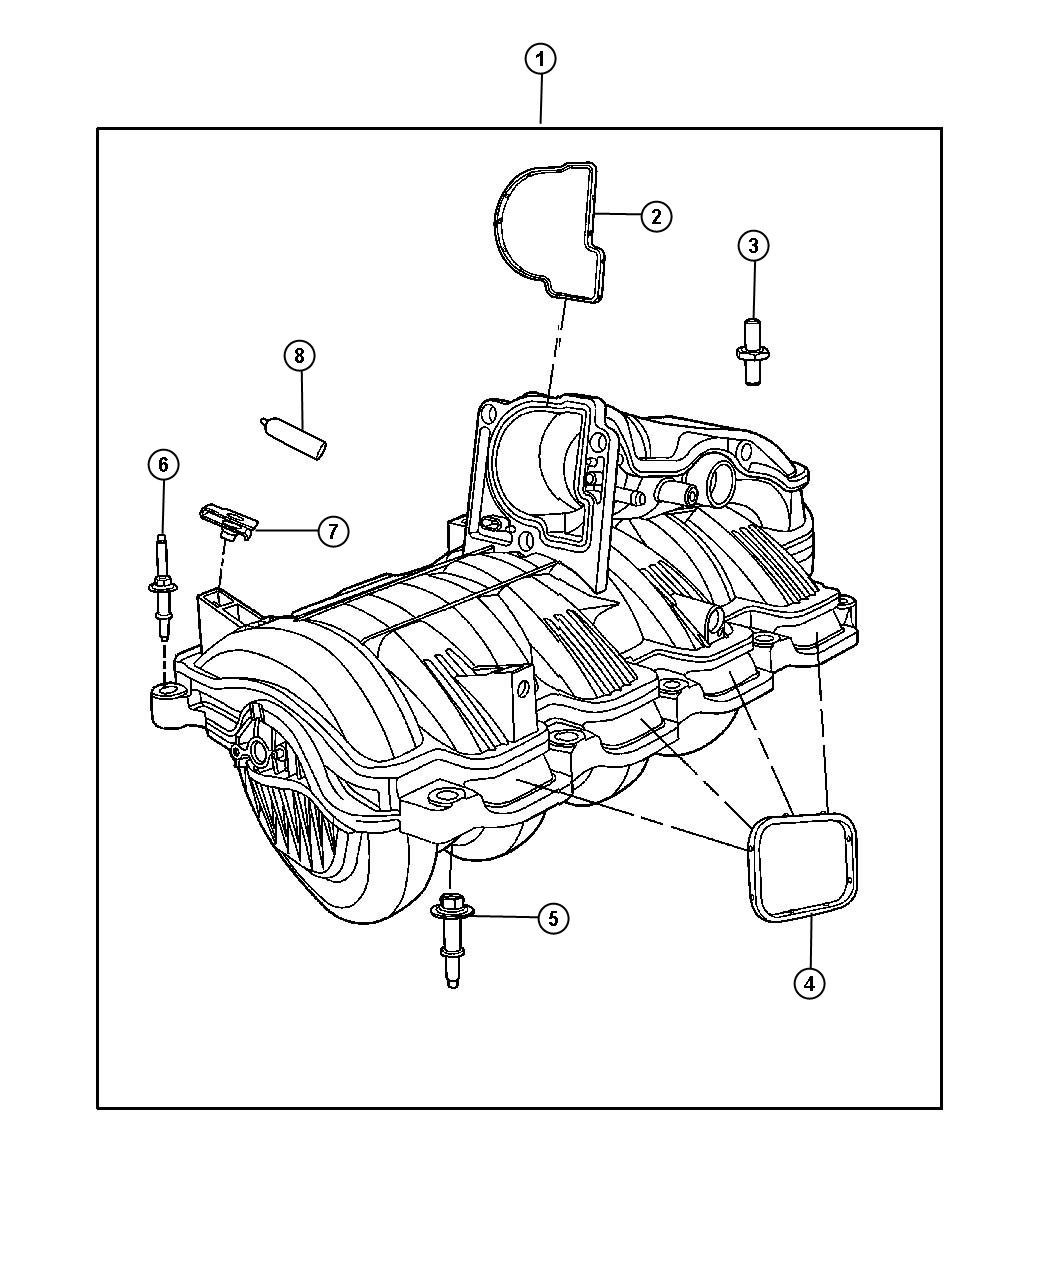 Dodge Ram Manifold Intake Engine Mpi Exhaust